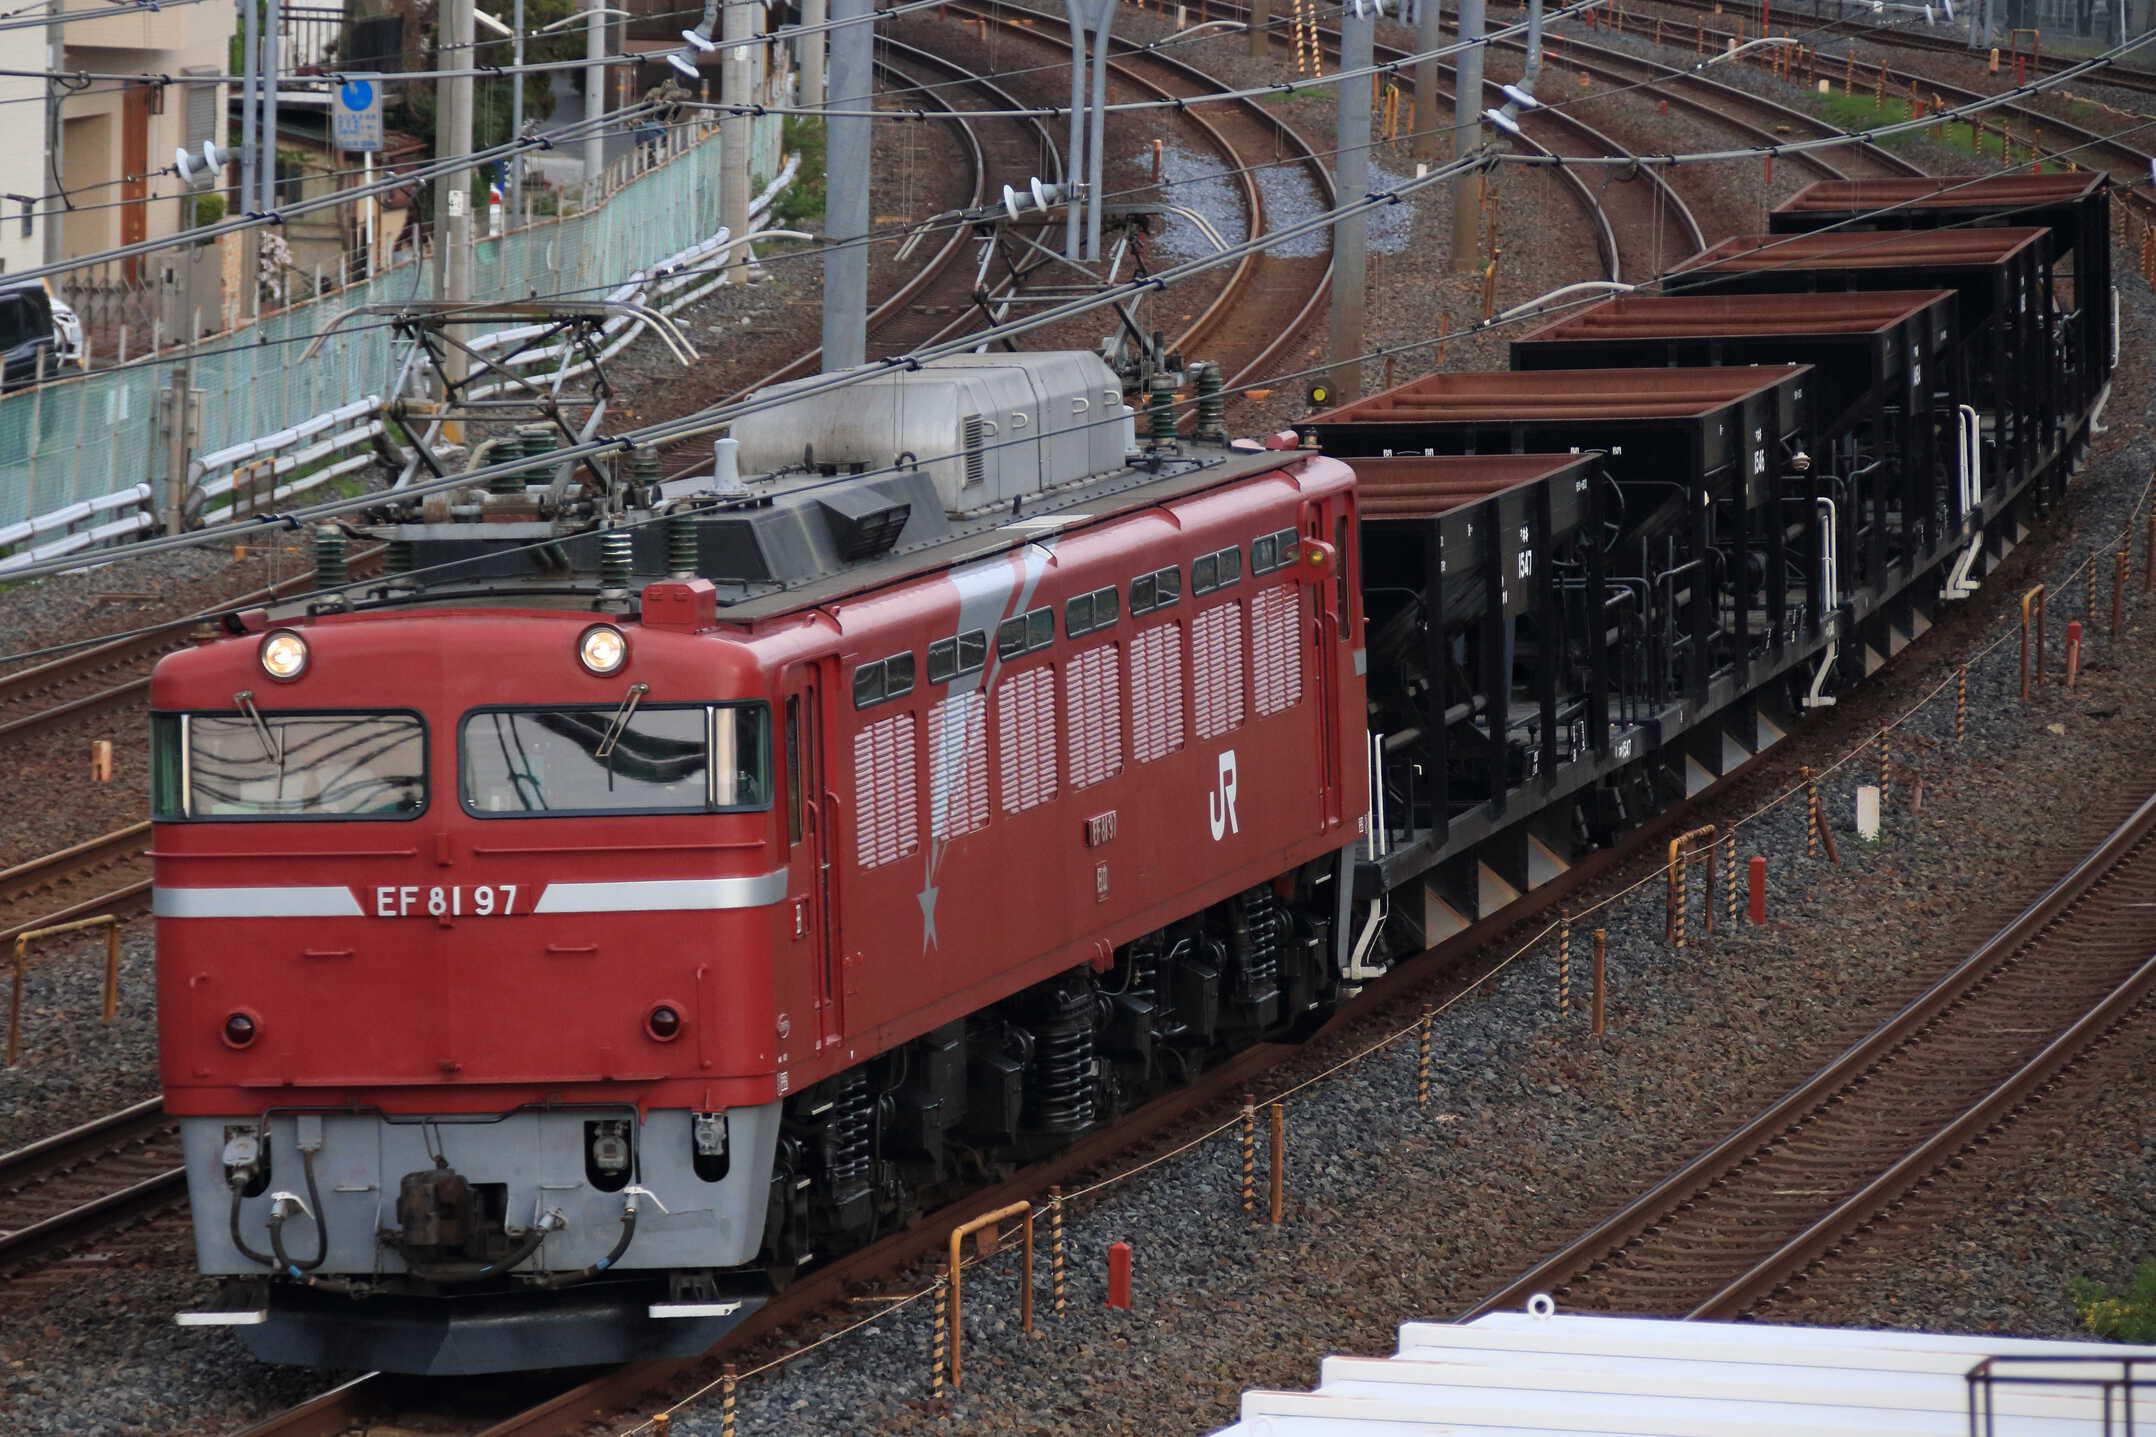 配8937列車 交検出場配給 EF81-97①[田]+ホキ5両